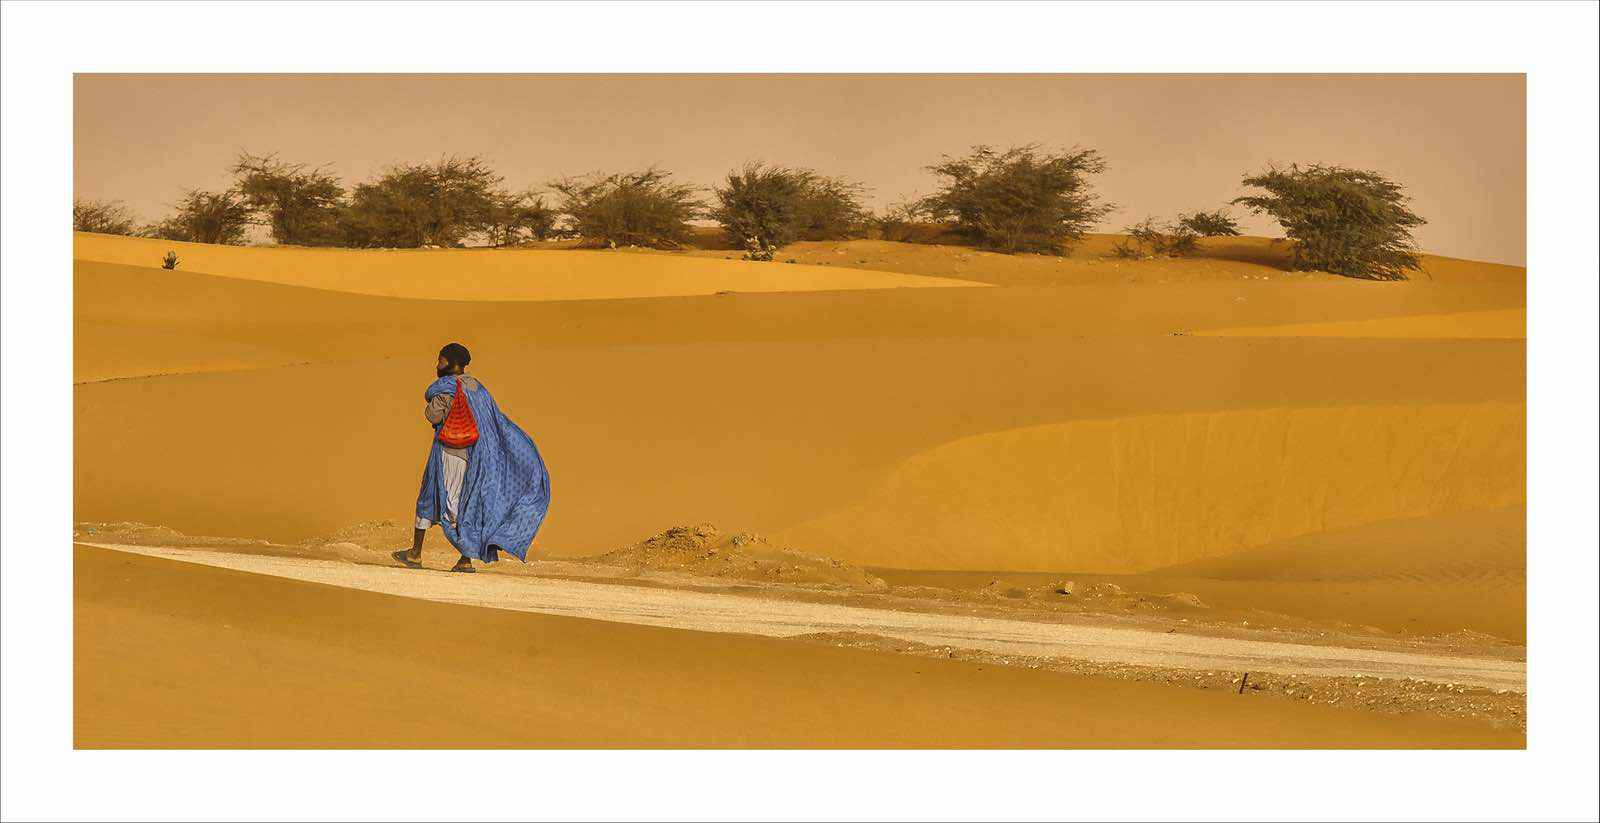 DESERT WANDERER MAURITANIA